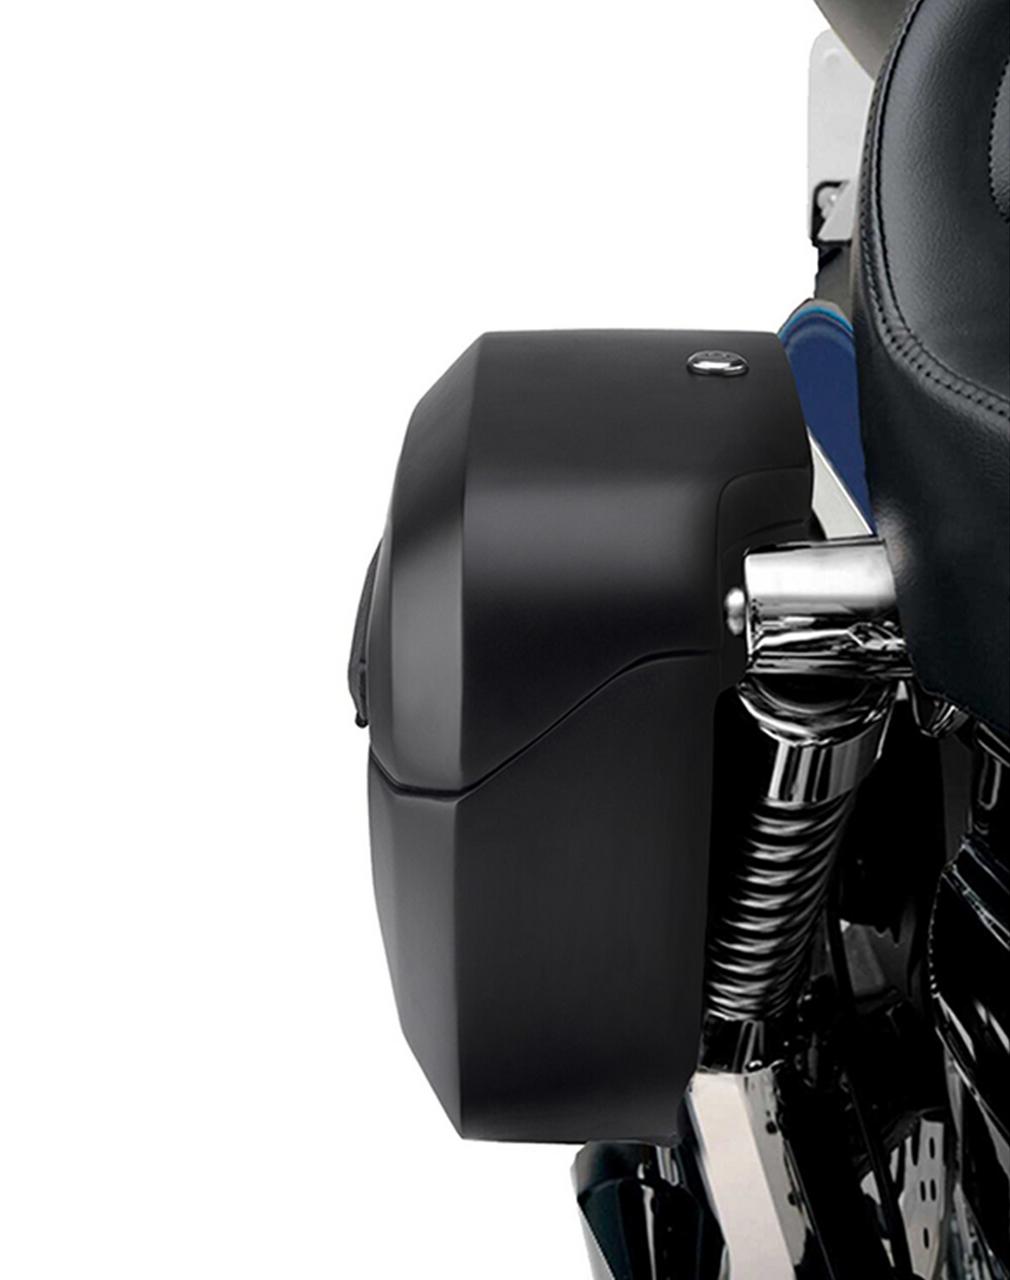 Viking Lamellar Shock Cutout Extra Large Matte Motorcycle Hard Saddlebags For Honda 1100 Shadow Sabre Shock cutout View